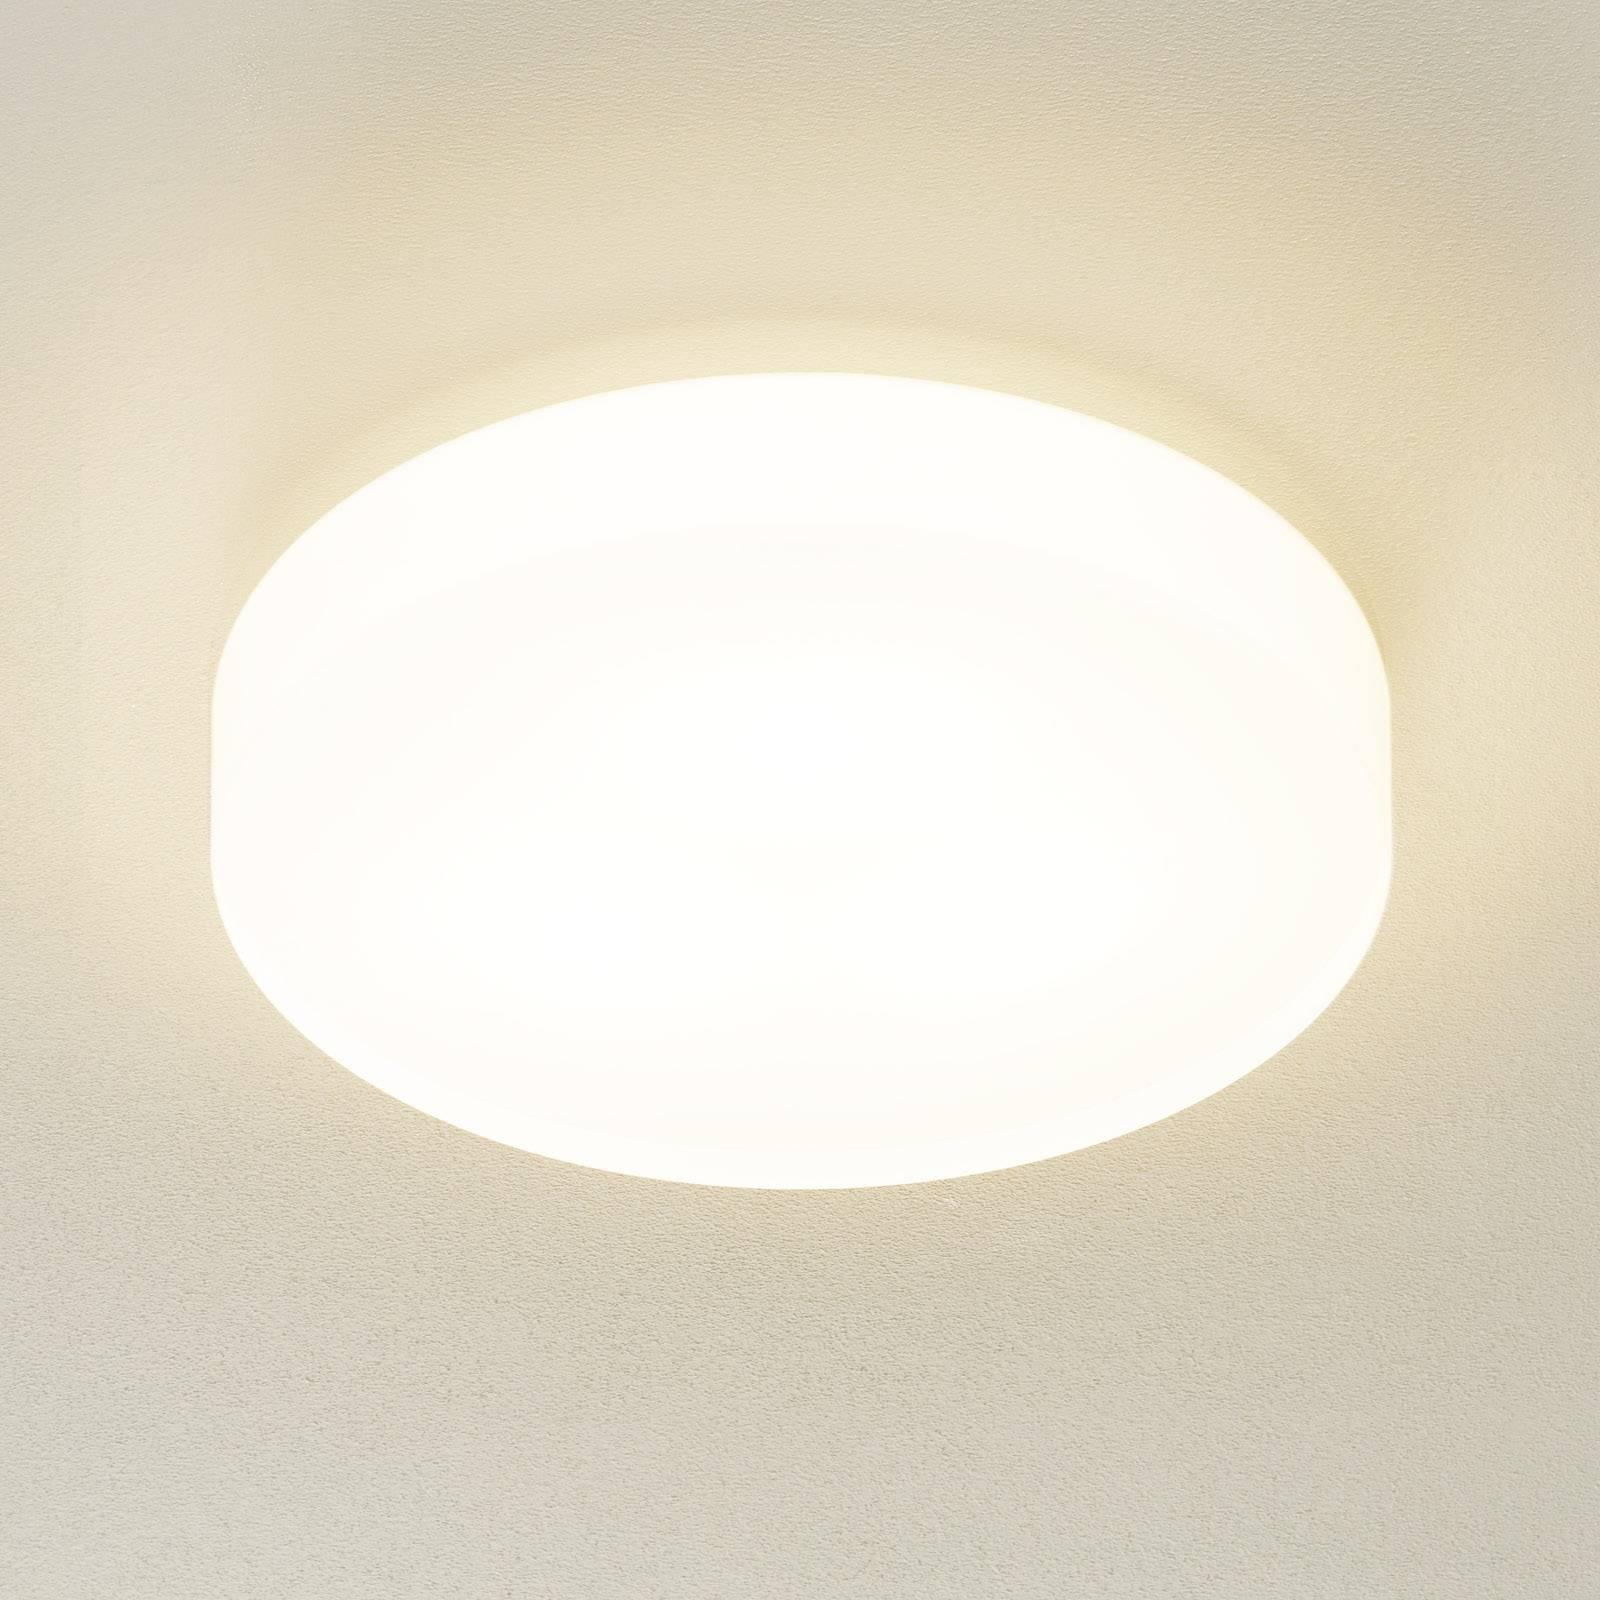 BEGA 89766 LED-kattolamppu E27 valkoinen Ø 47cm